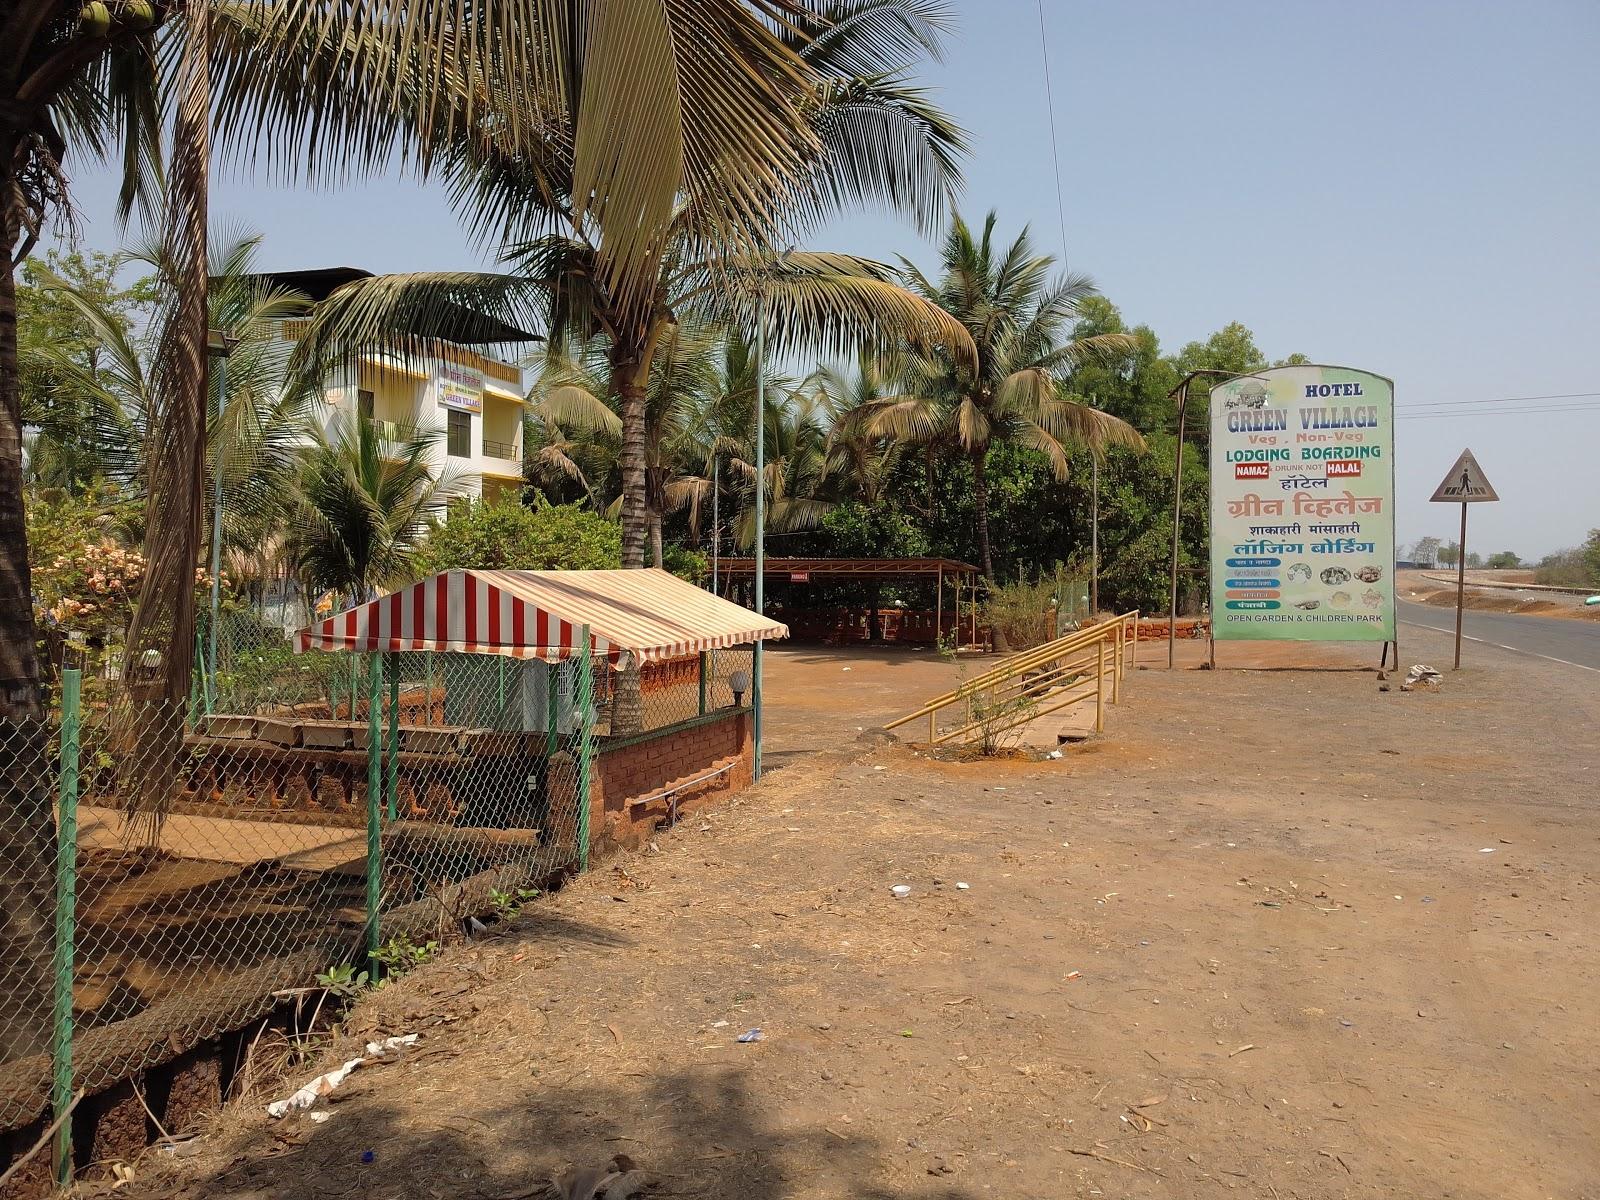 Hotel Green Village Map - Mahabaleshwar, India - Mapcarta